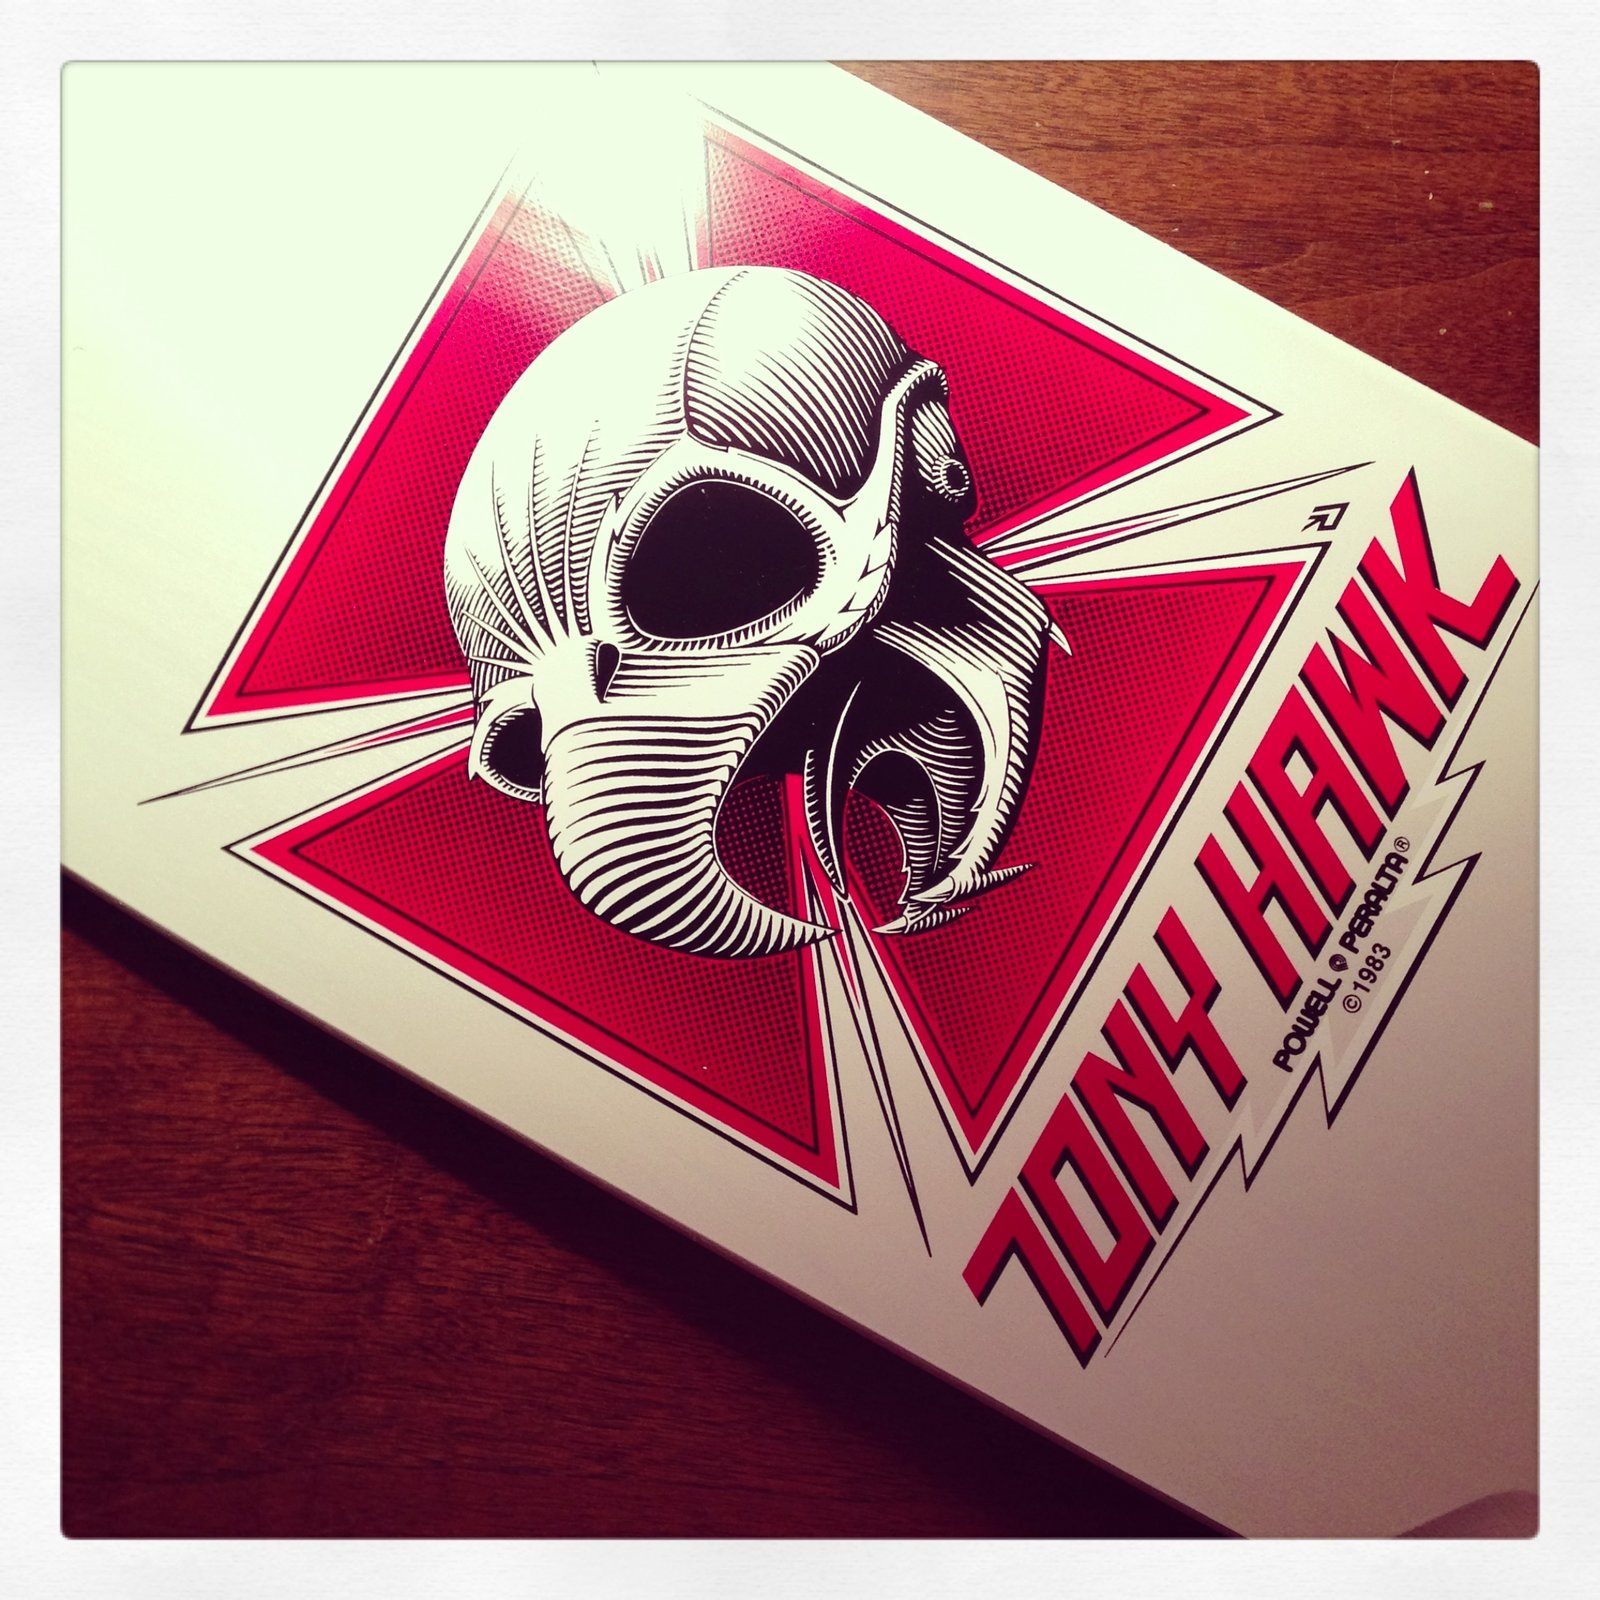 Tony Hawk by Powell Peralta #tonyhawk #skateboard #skate